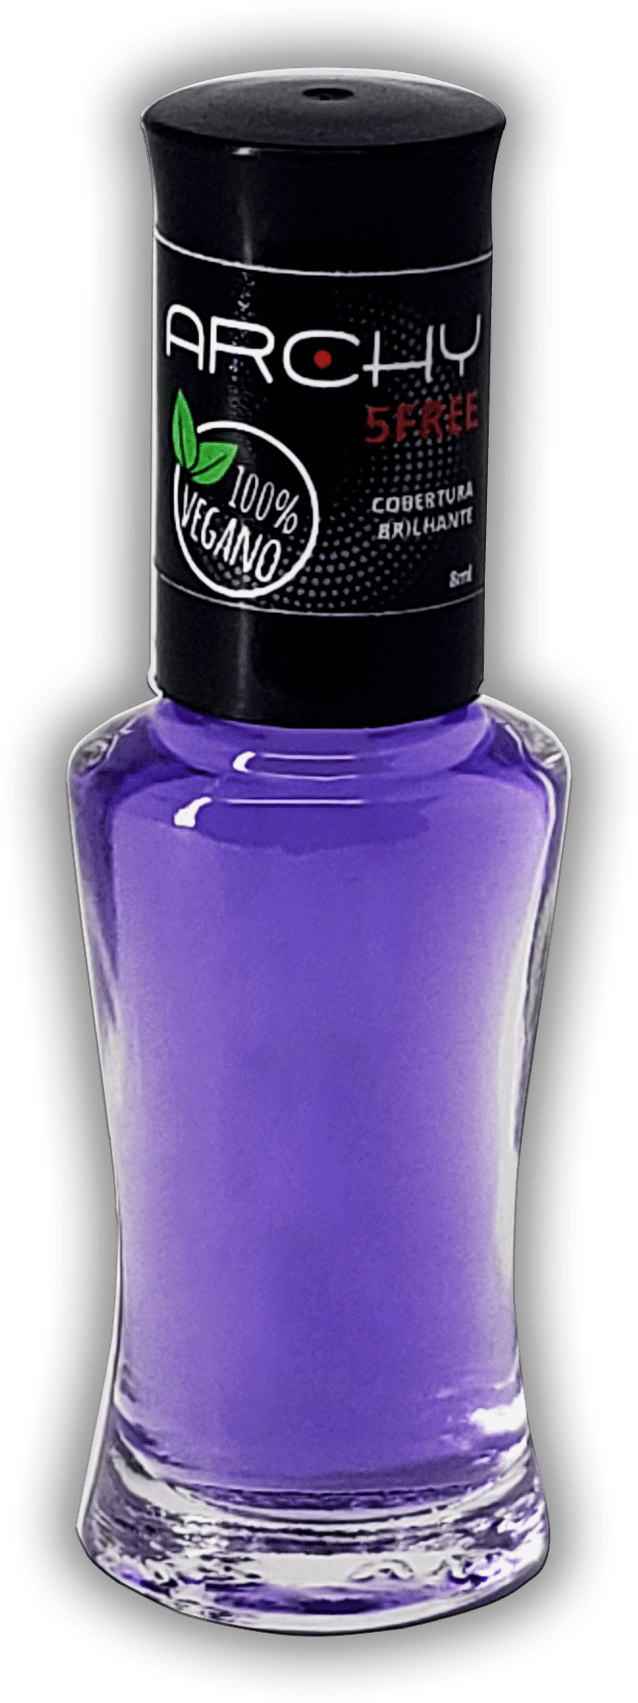 Esmalte Vegano 5 Free Cobertura Brilhante - Archy Make Up